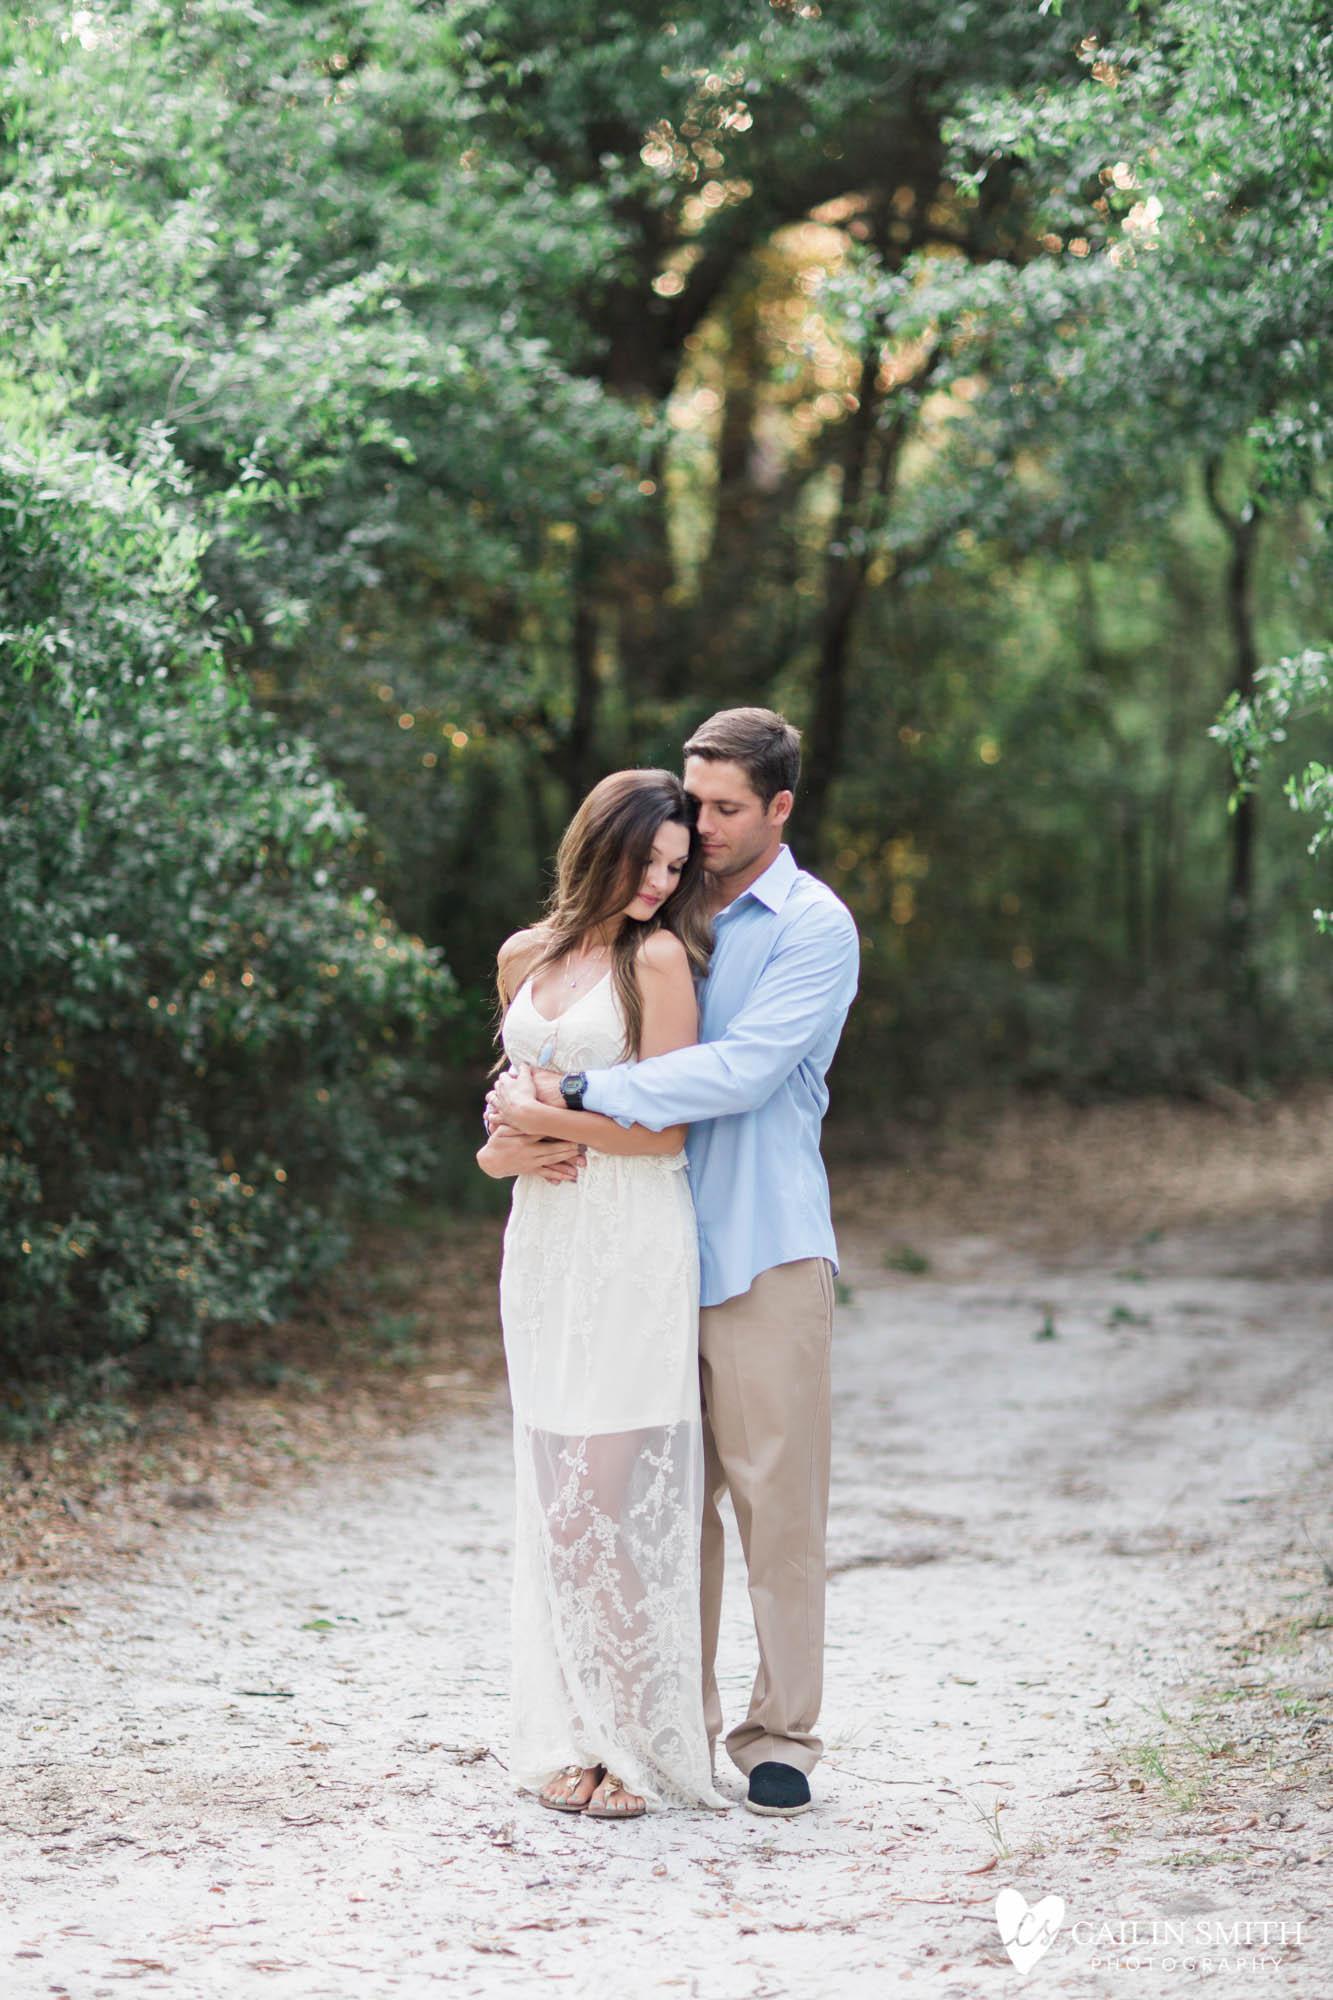 Megan_Tyson_Little_Talbot_Engagement_004.jpg